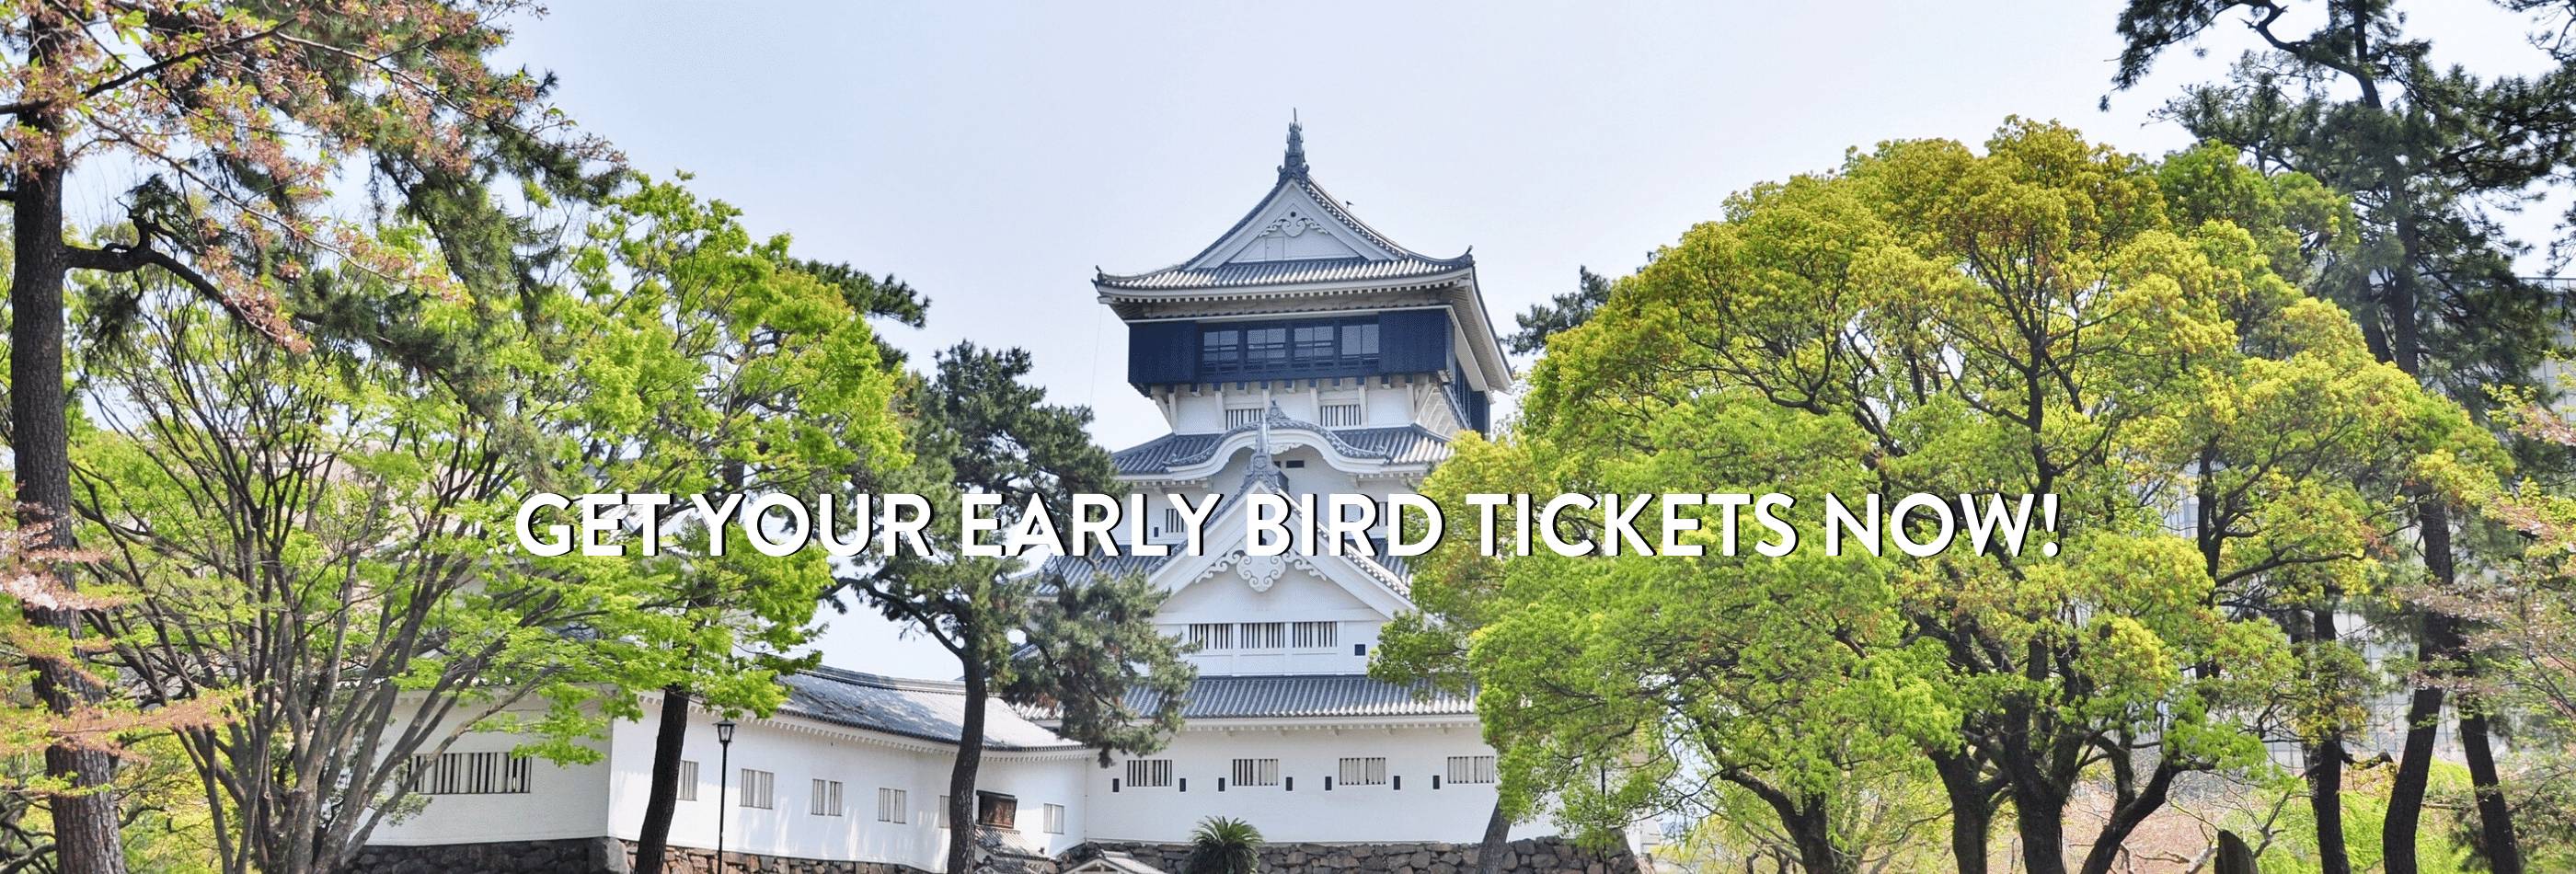 Cofiring 9 early bird tickets